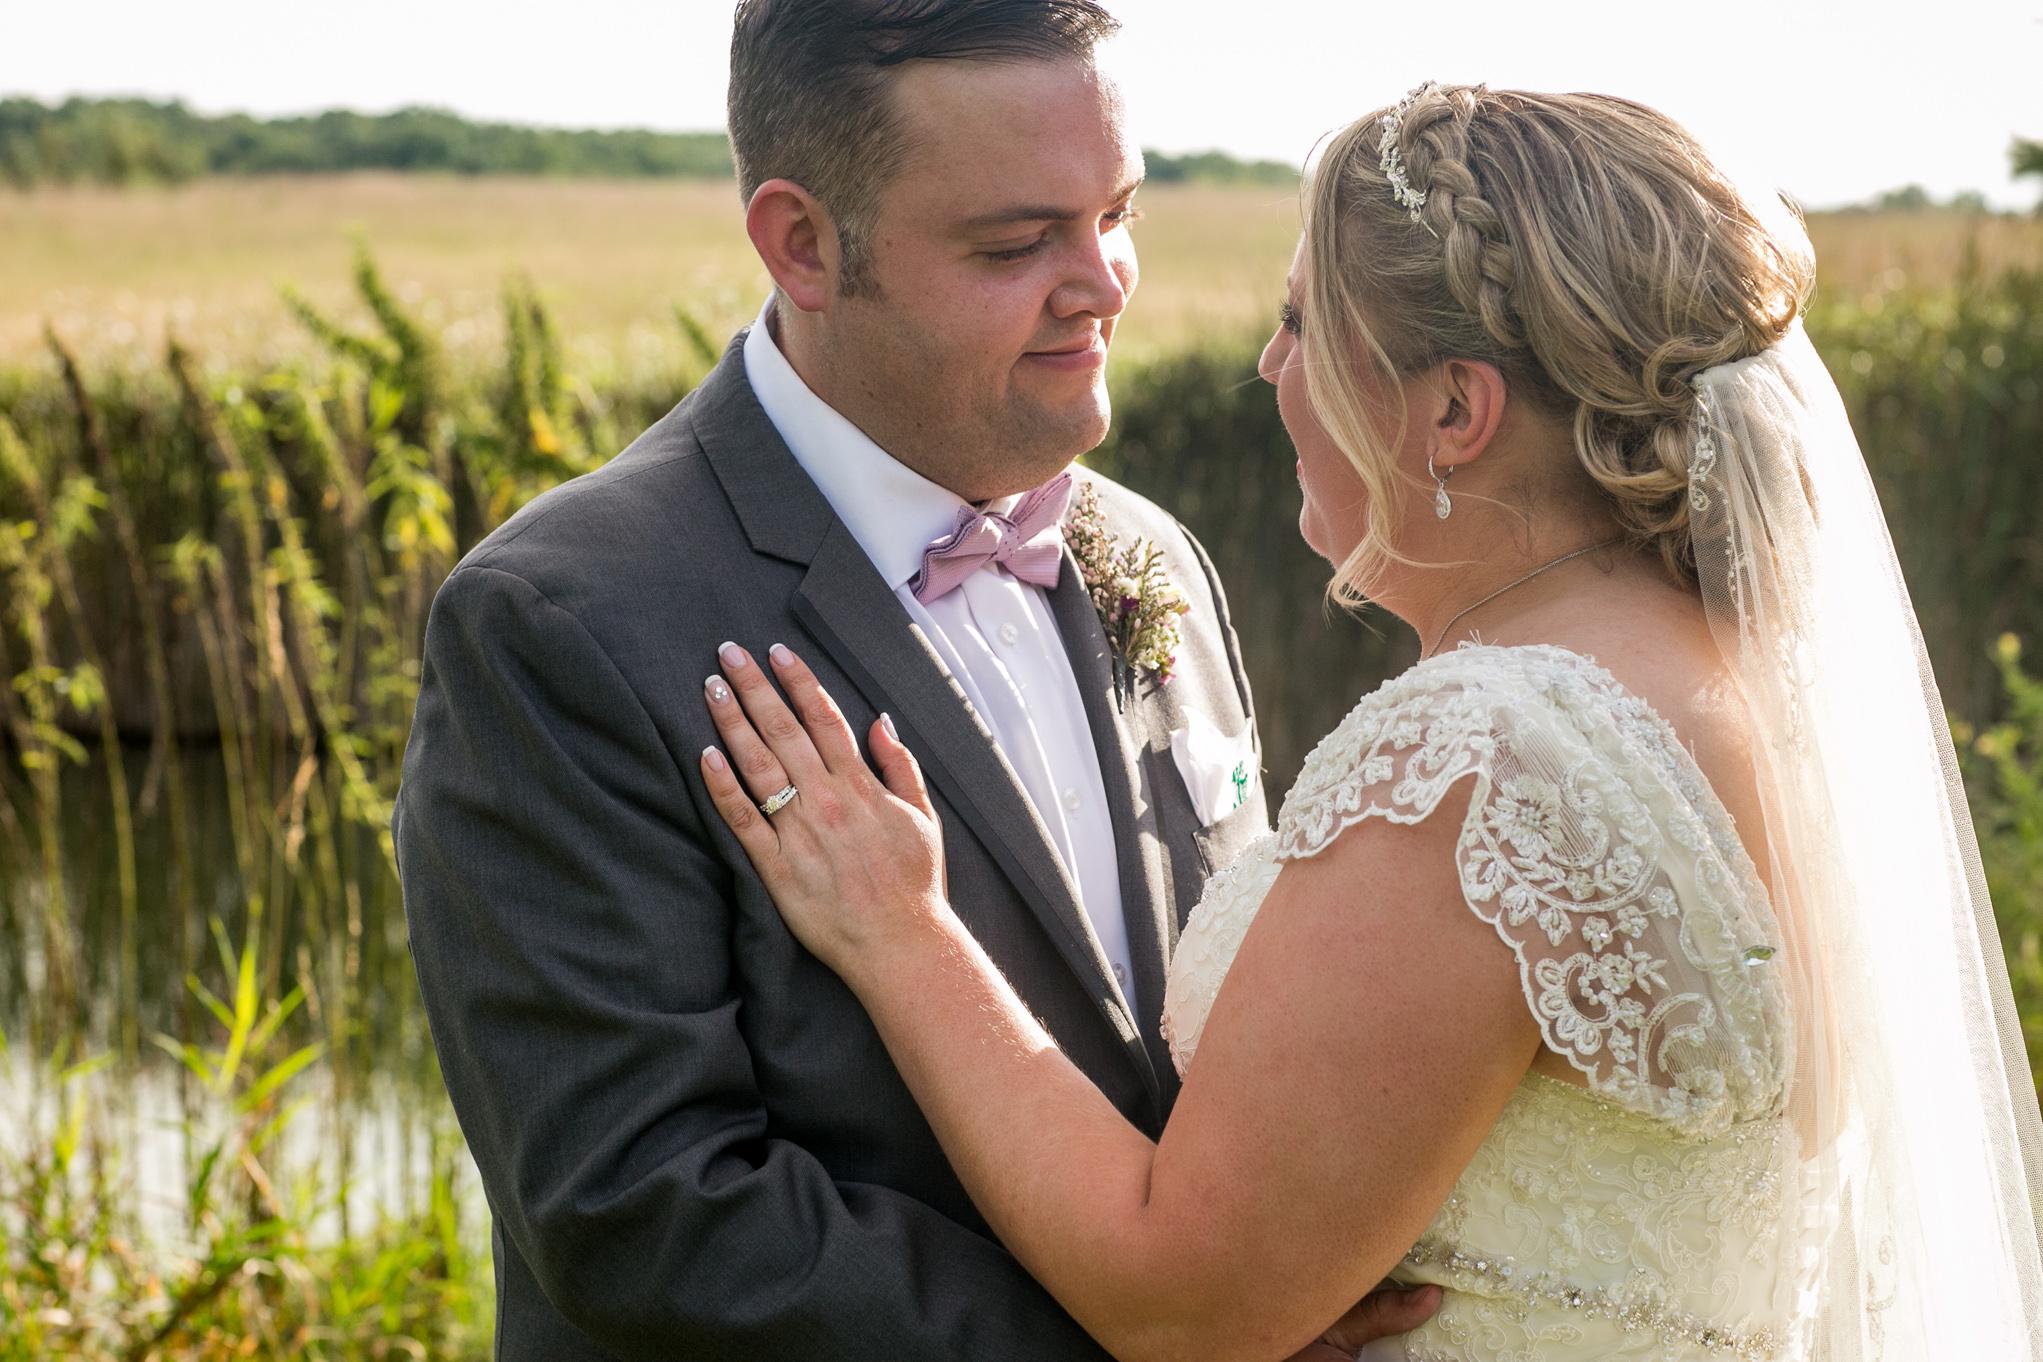 Orchard Ridge Farms Wedding | Trish + Eamonn 0557.jpg